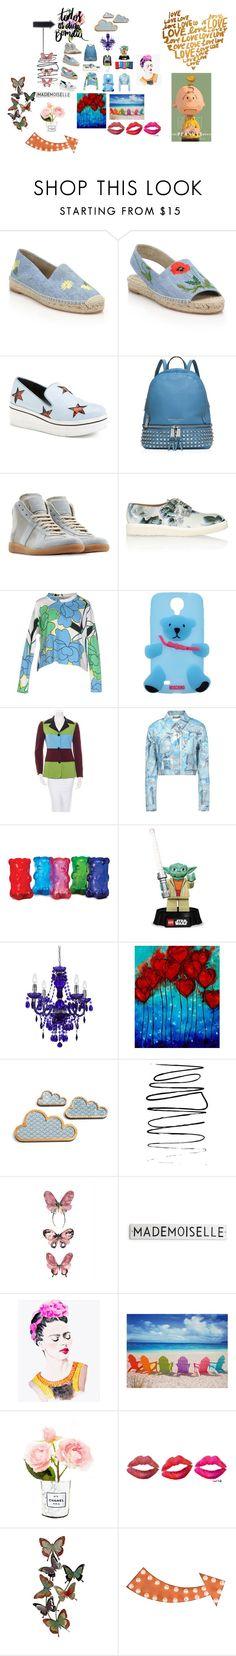 """All Blue"" by rosastreet on Polyvore featuring moda, STELLA McCARTNEY, MICHAEL Michael Kors, Maison Margiela, Marni, Moschino, Lego, AF Lighting, Chanel e Dot & Bo"